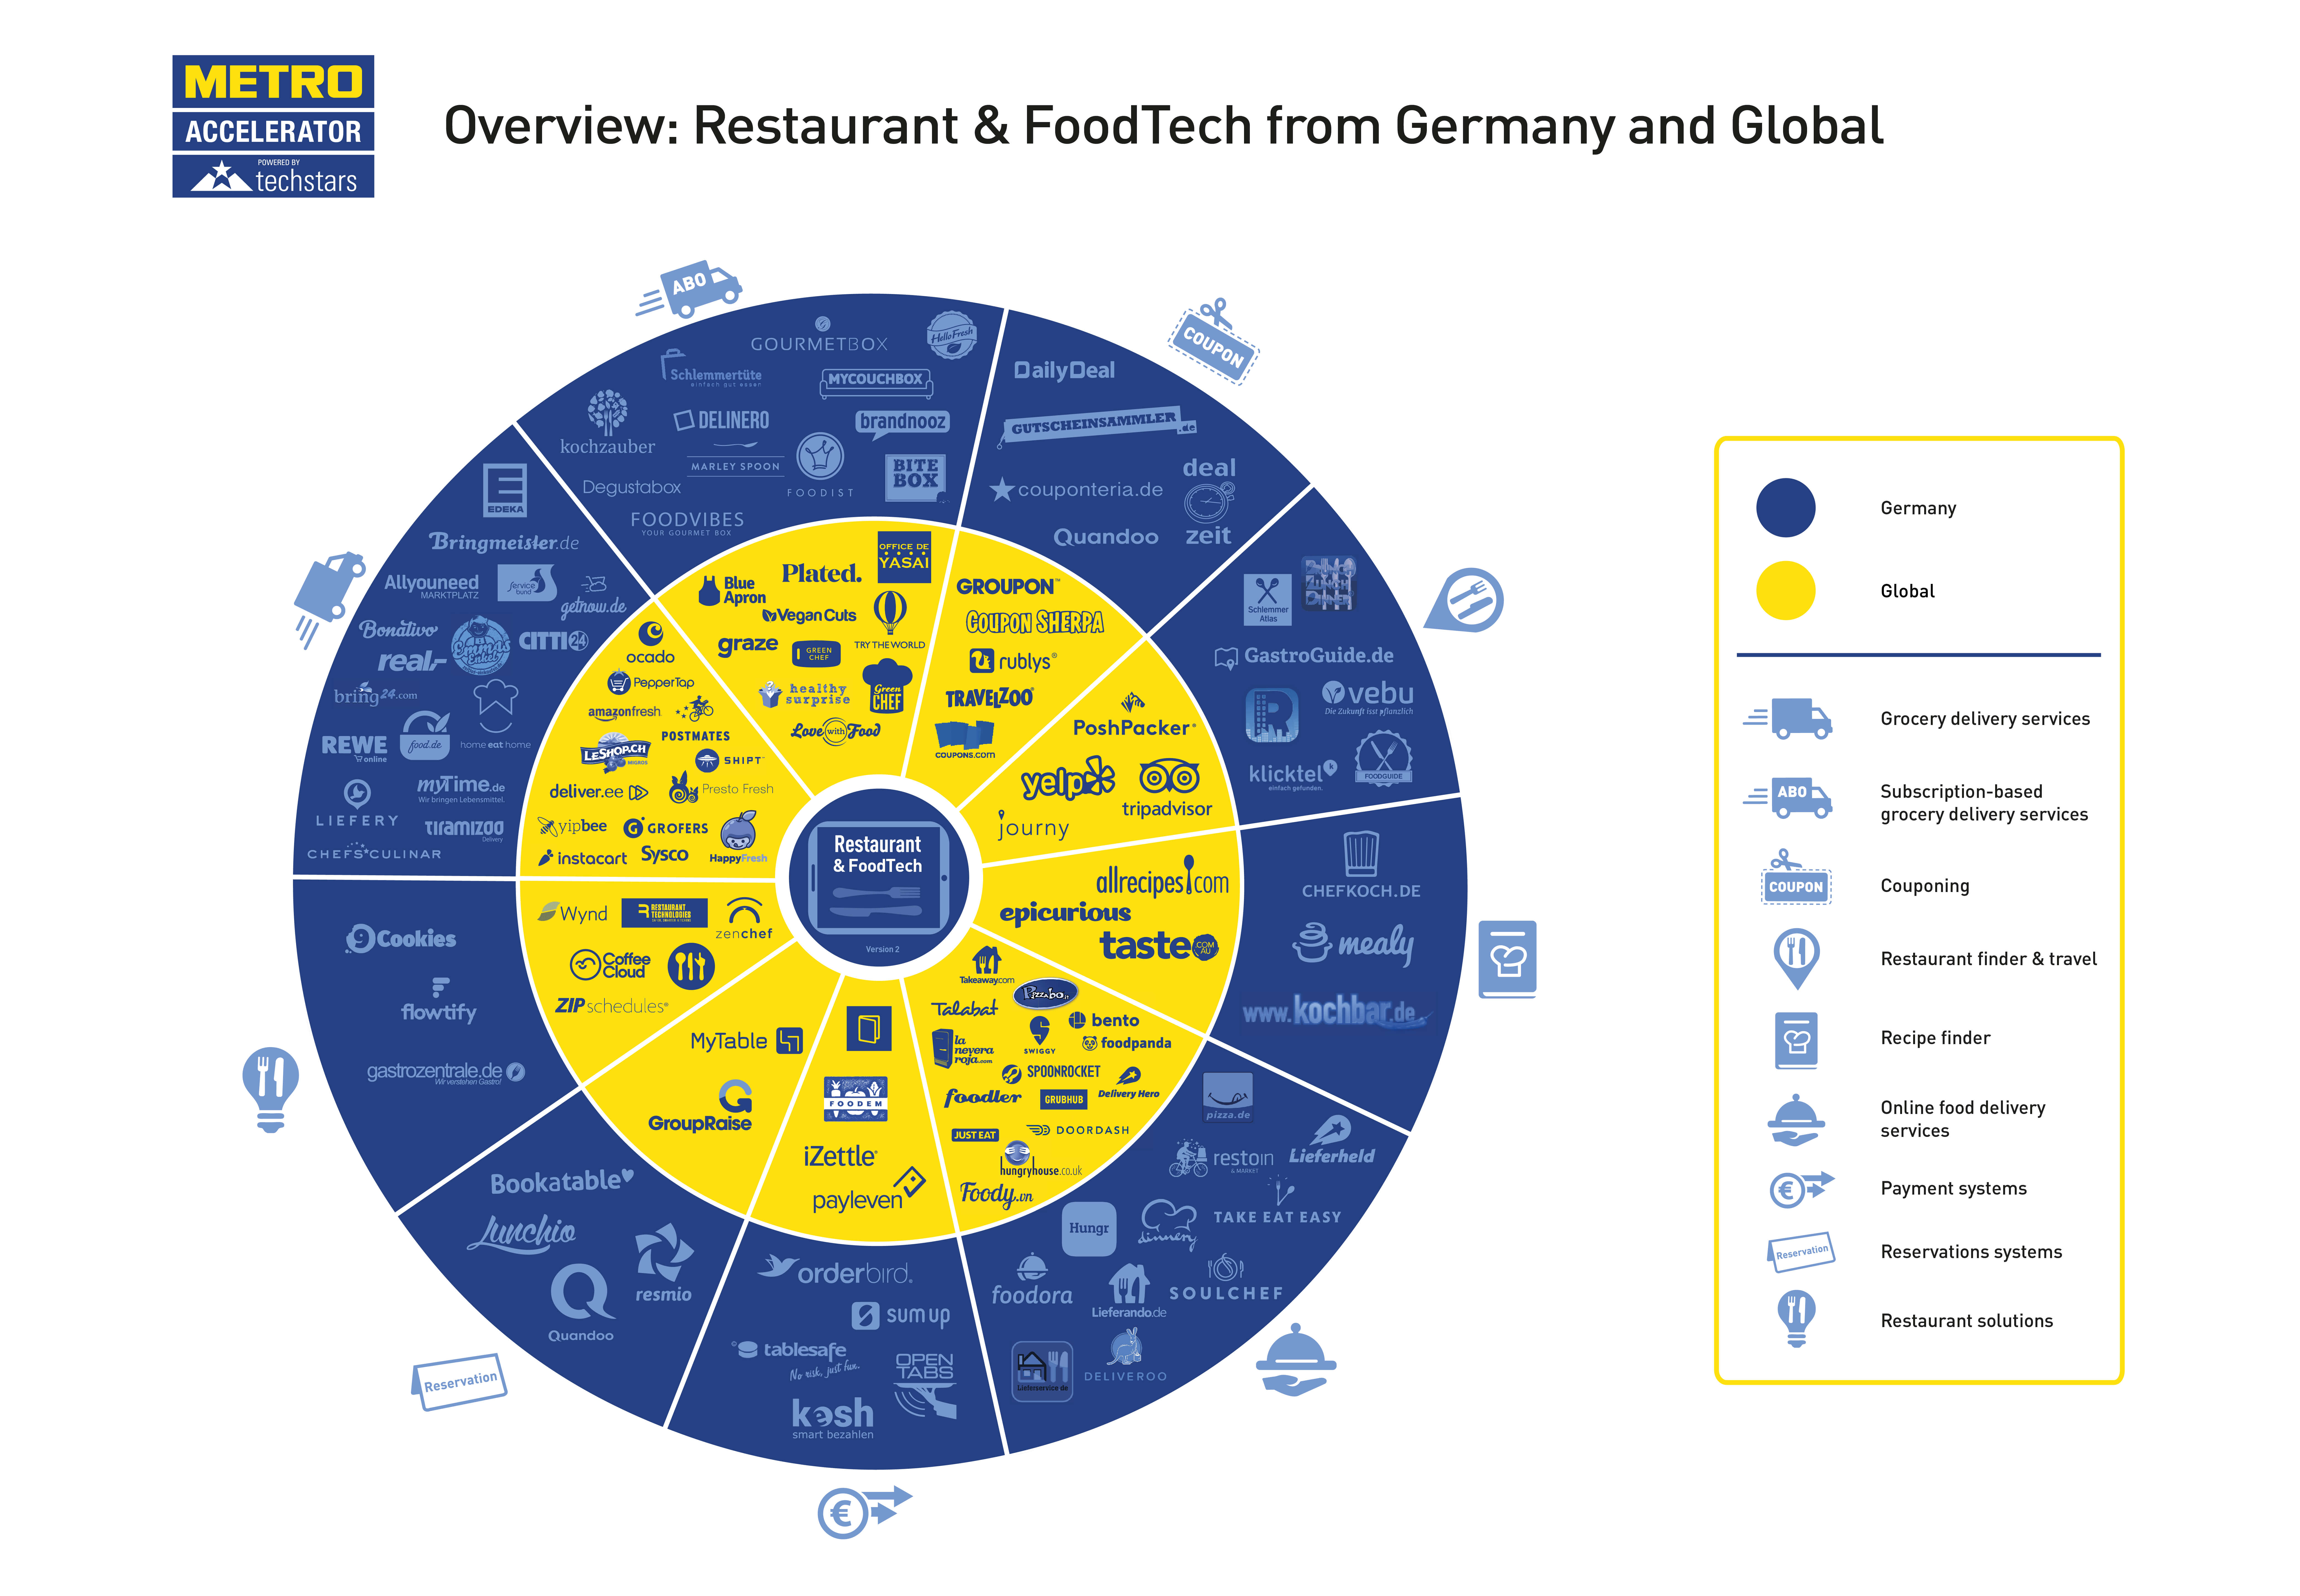 Restaurant & FoodTech 2016